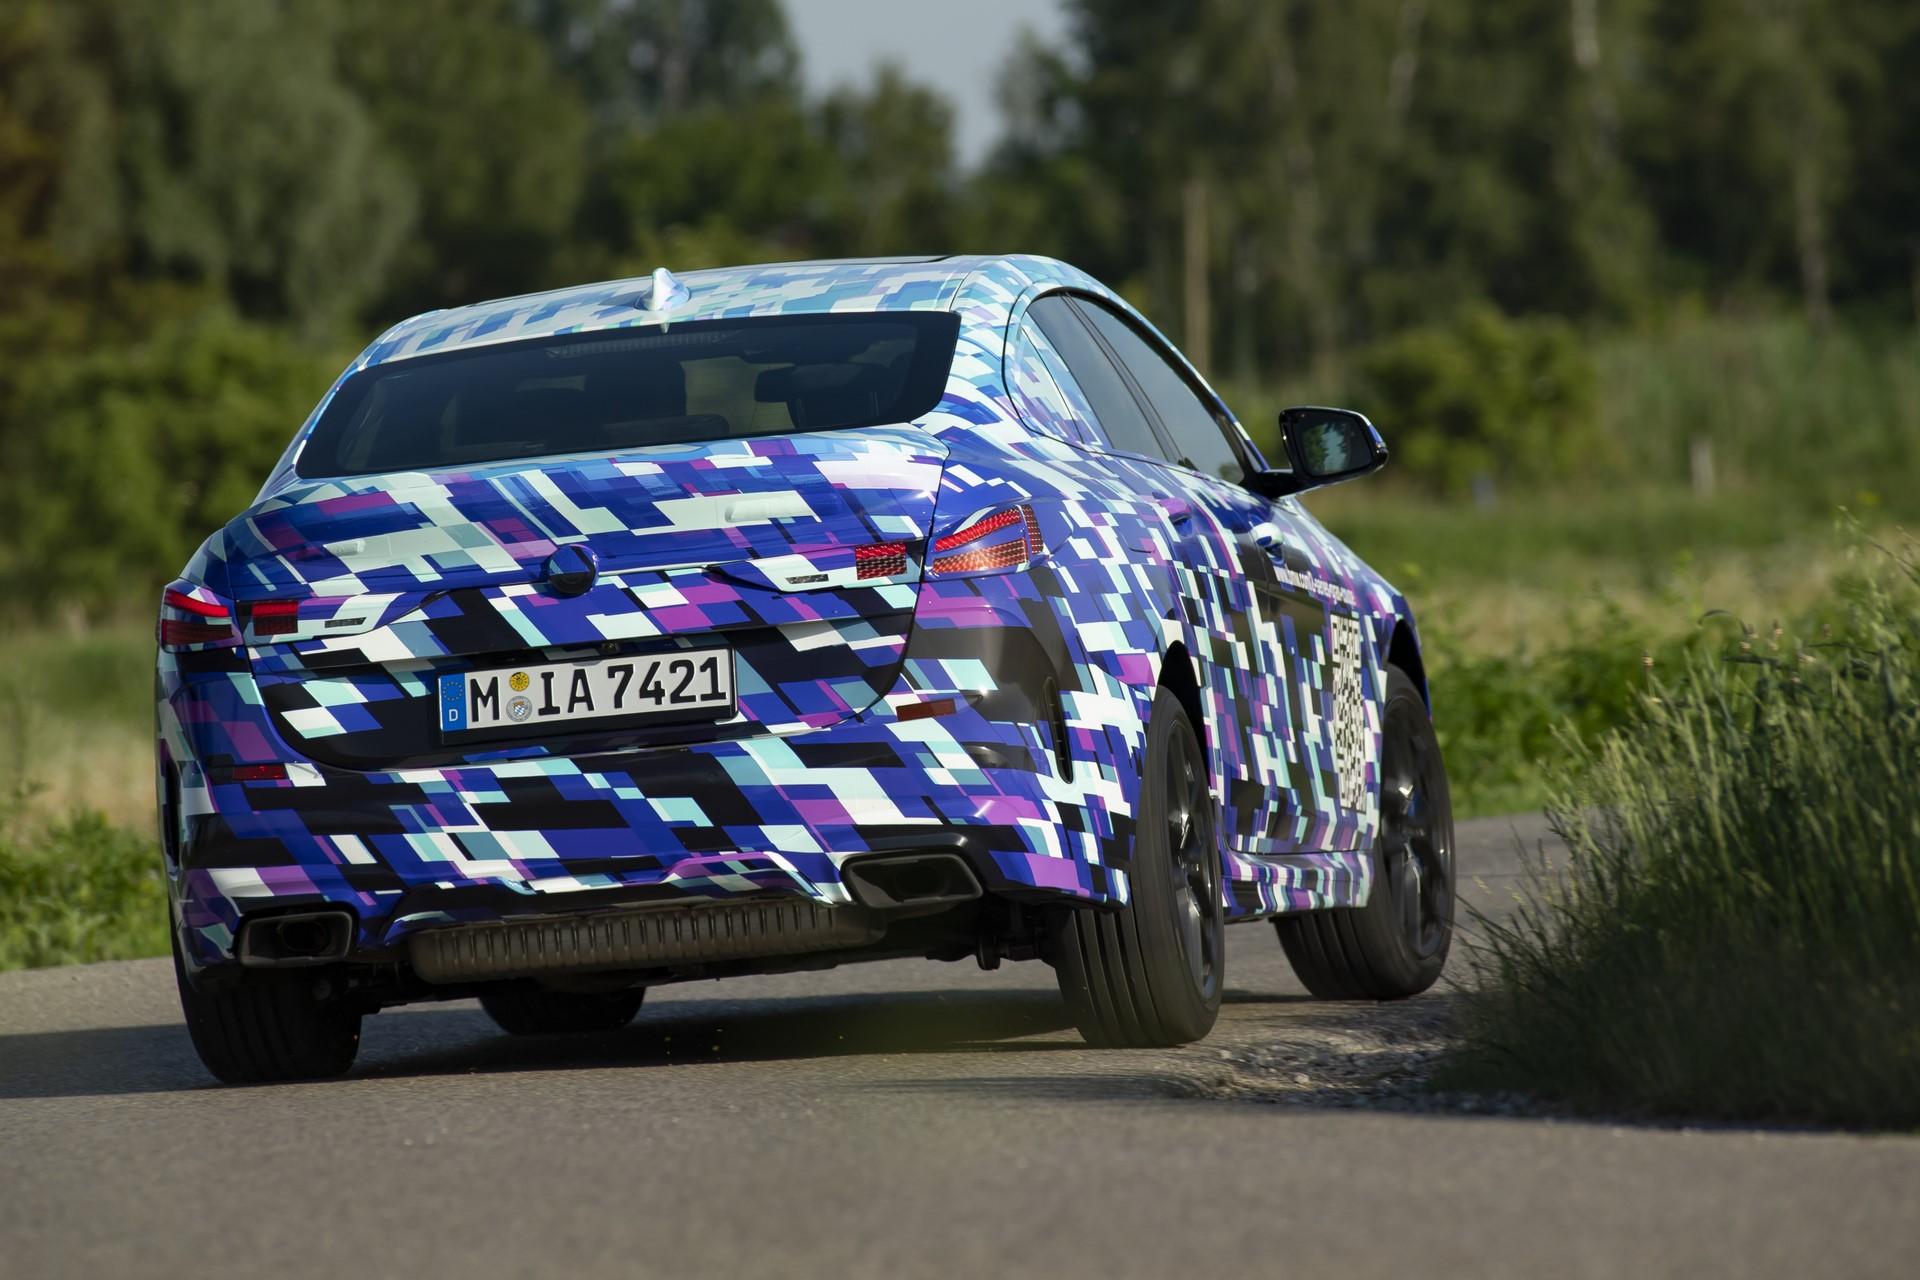 BMW-2-Series-Gran-Coupe-2020-spy-photos-8